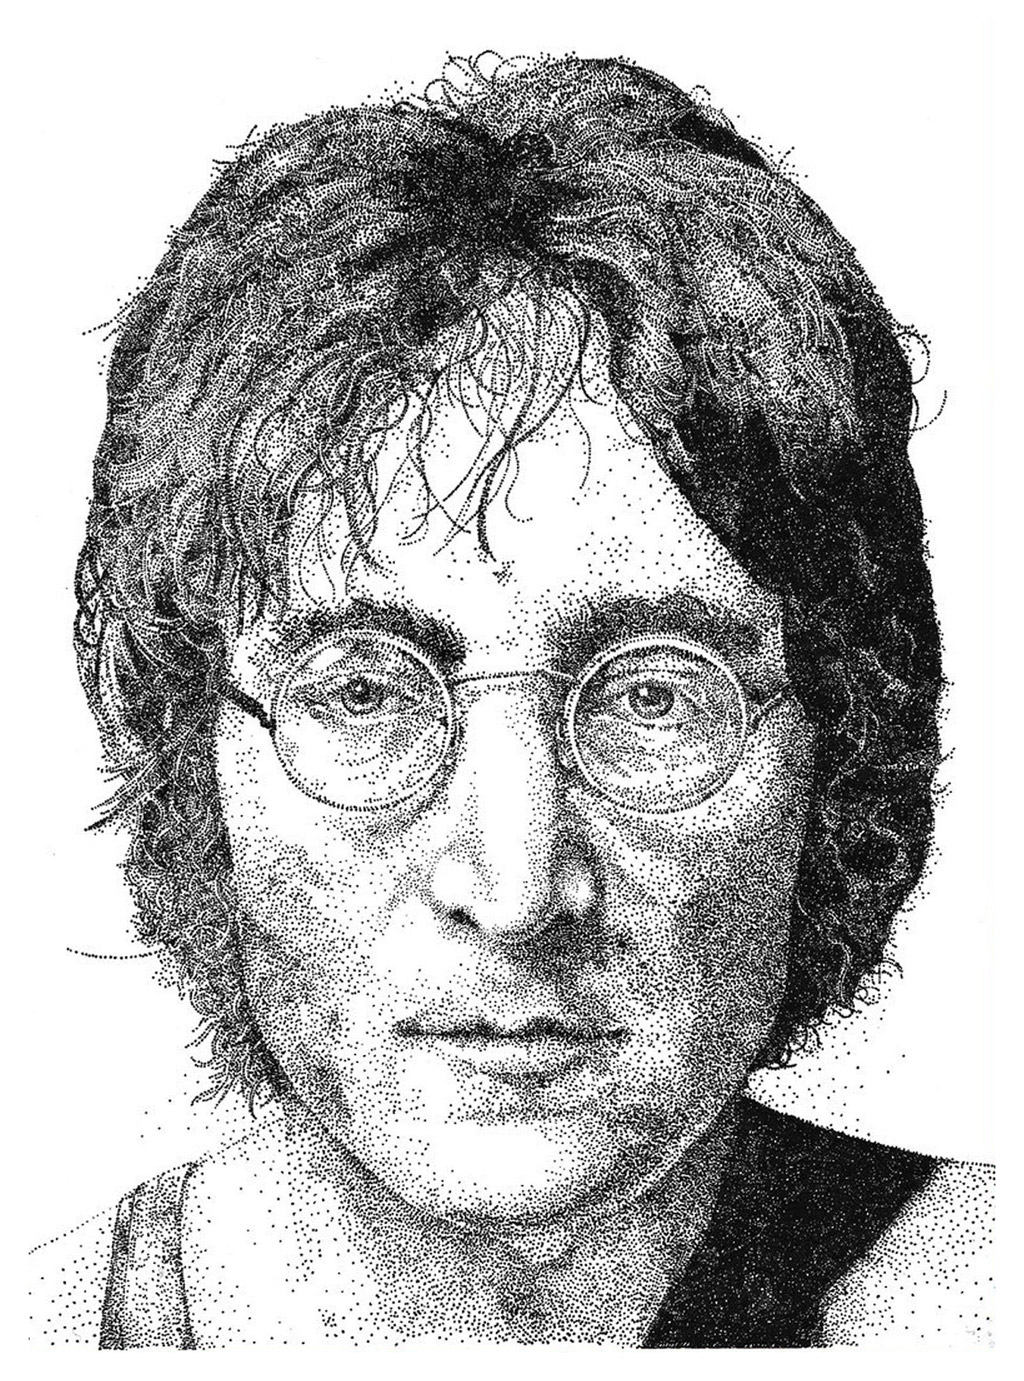 drawing type pointilism john lennon portrait by celciuscreations